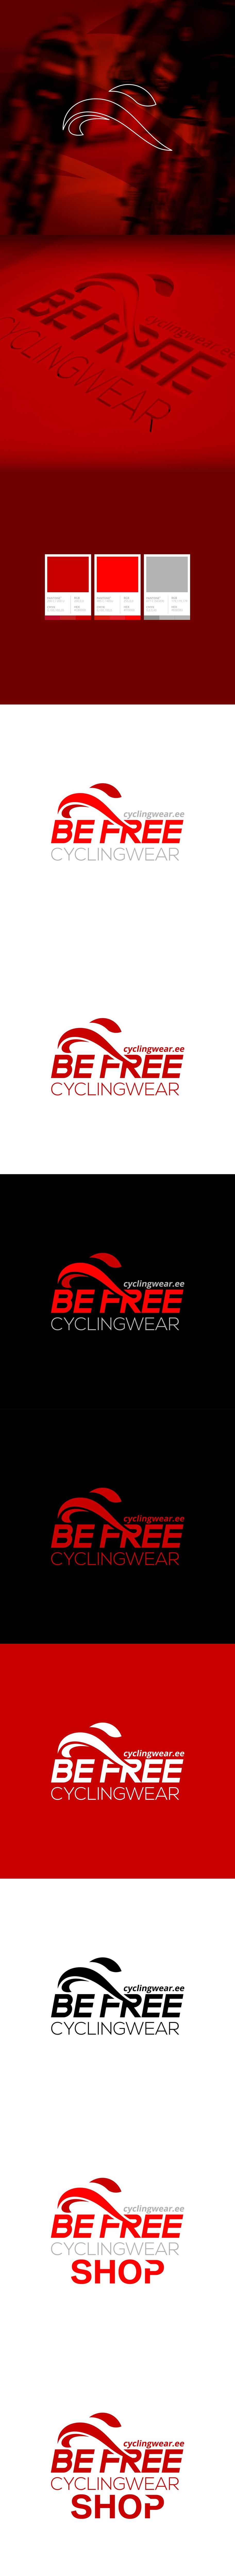 BeFreeCycling-logo-1